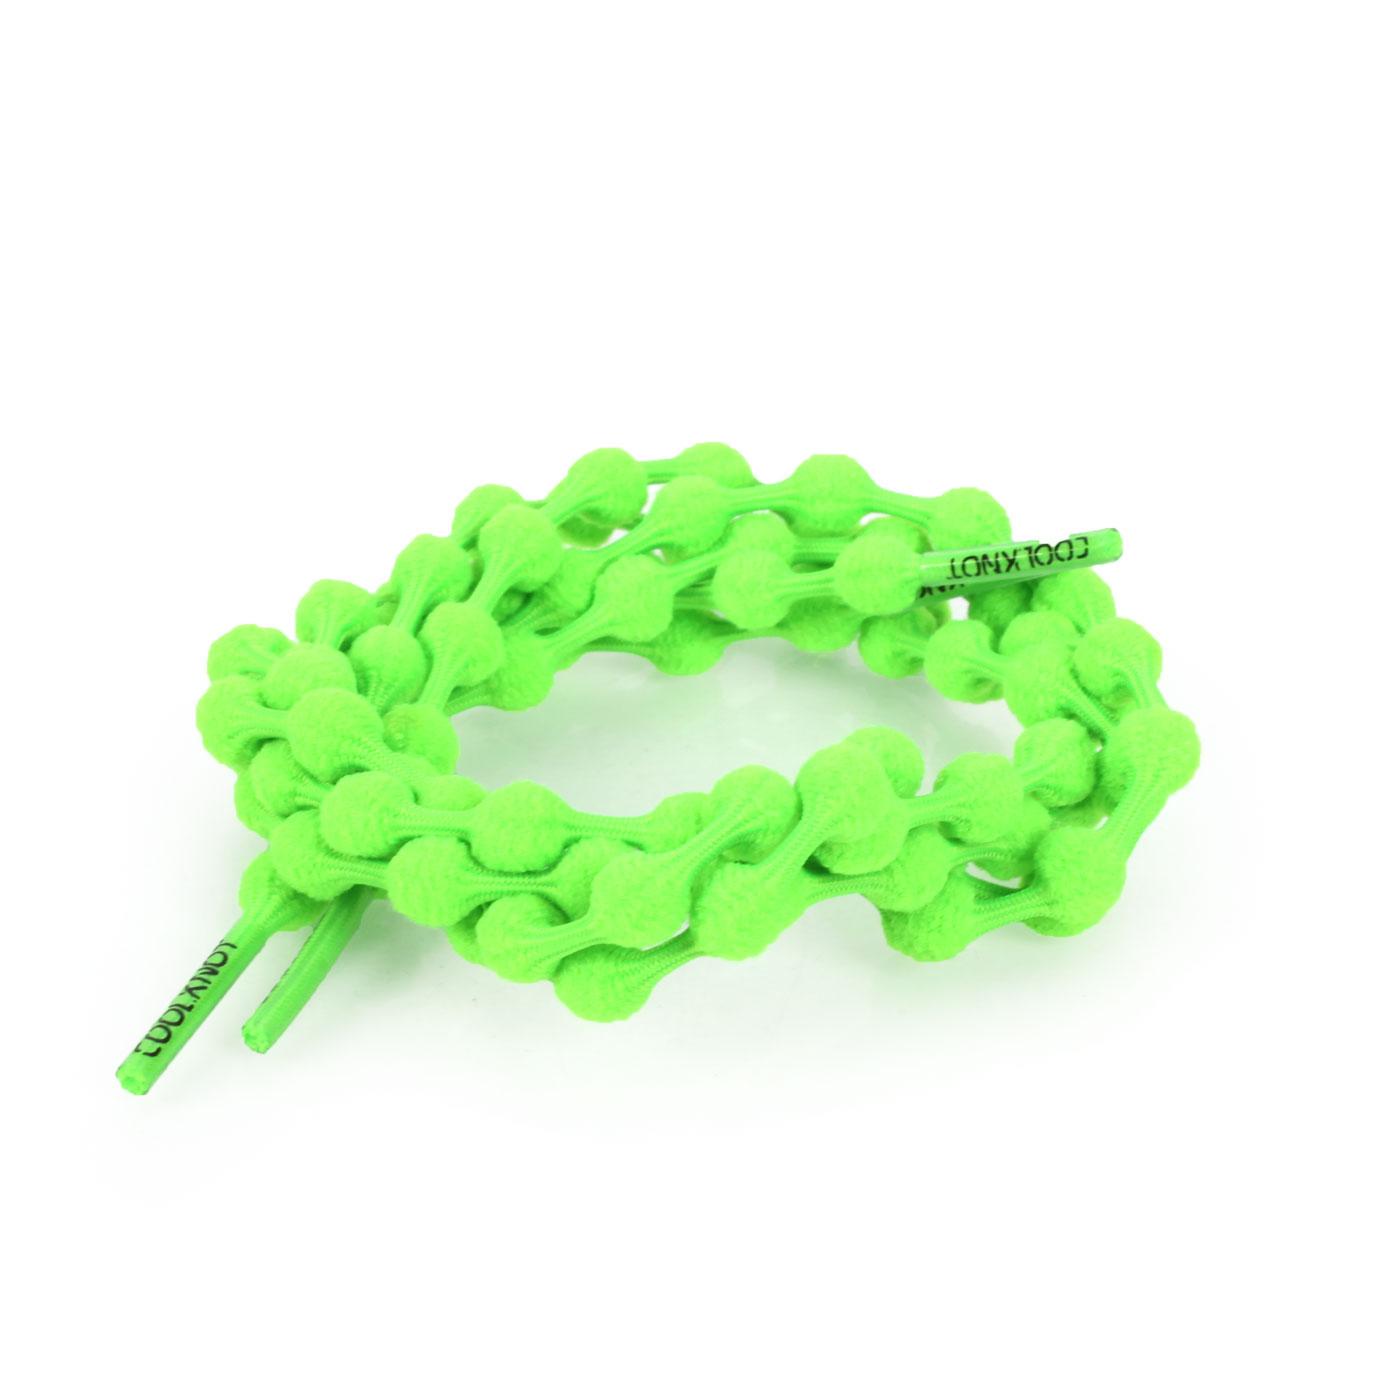 COOLKNOT 豆豆鞋帶(舒適款)60CM 6026201 - 螢光綠